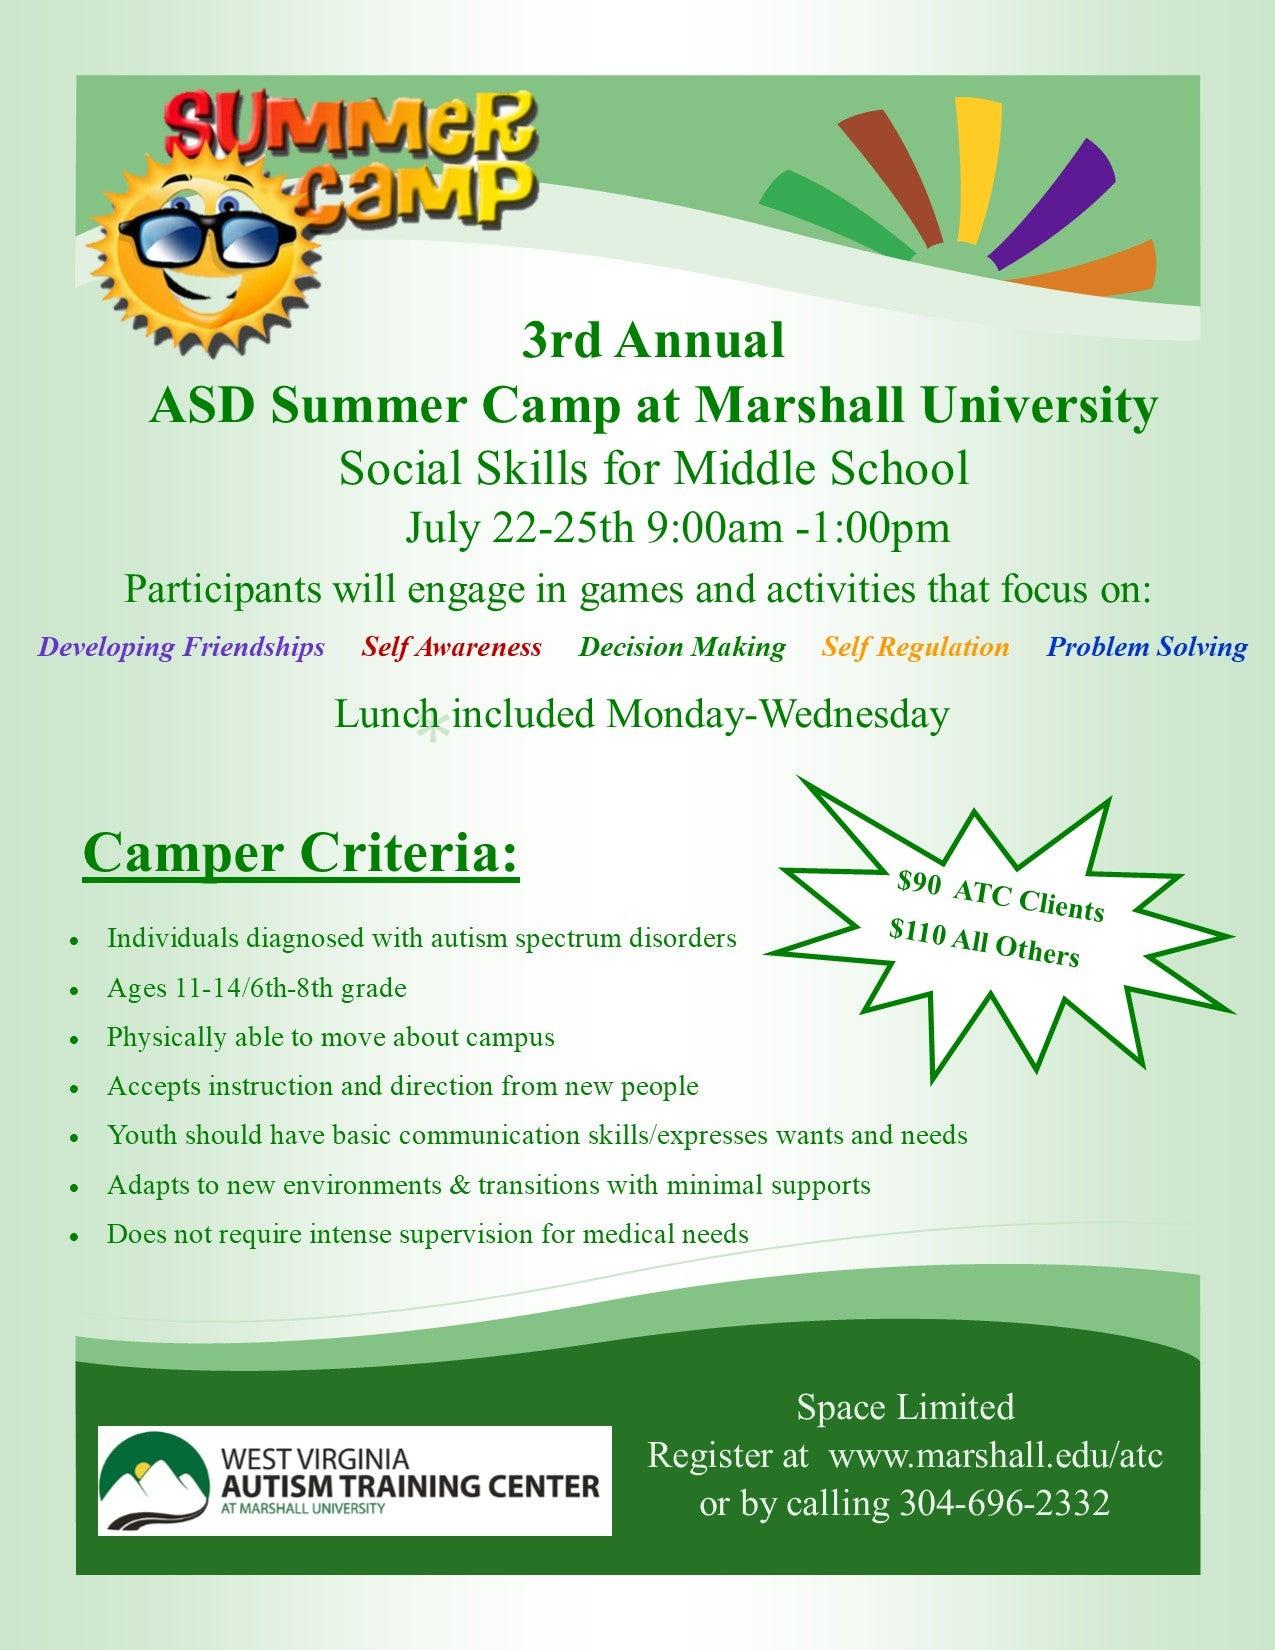 2019 ASD Marshall Summer Camp – Autism Training Center